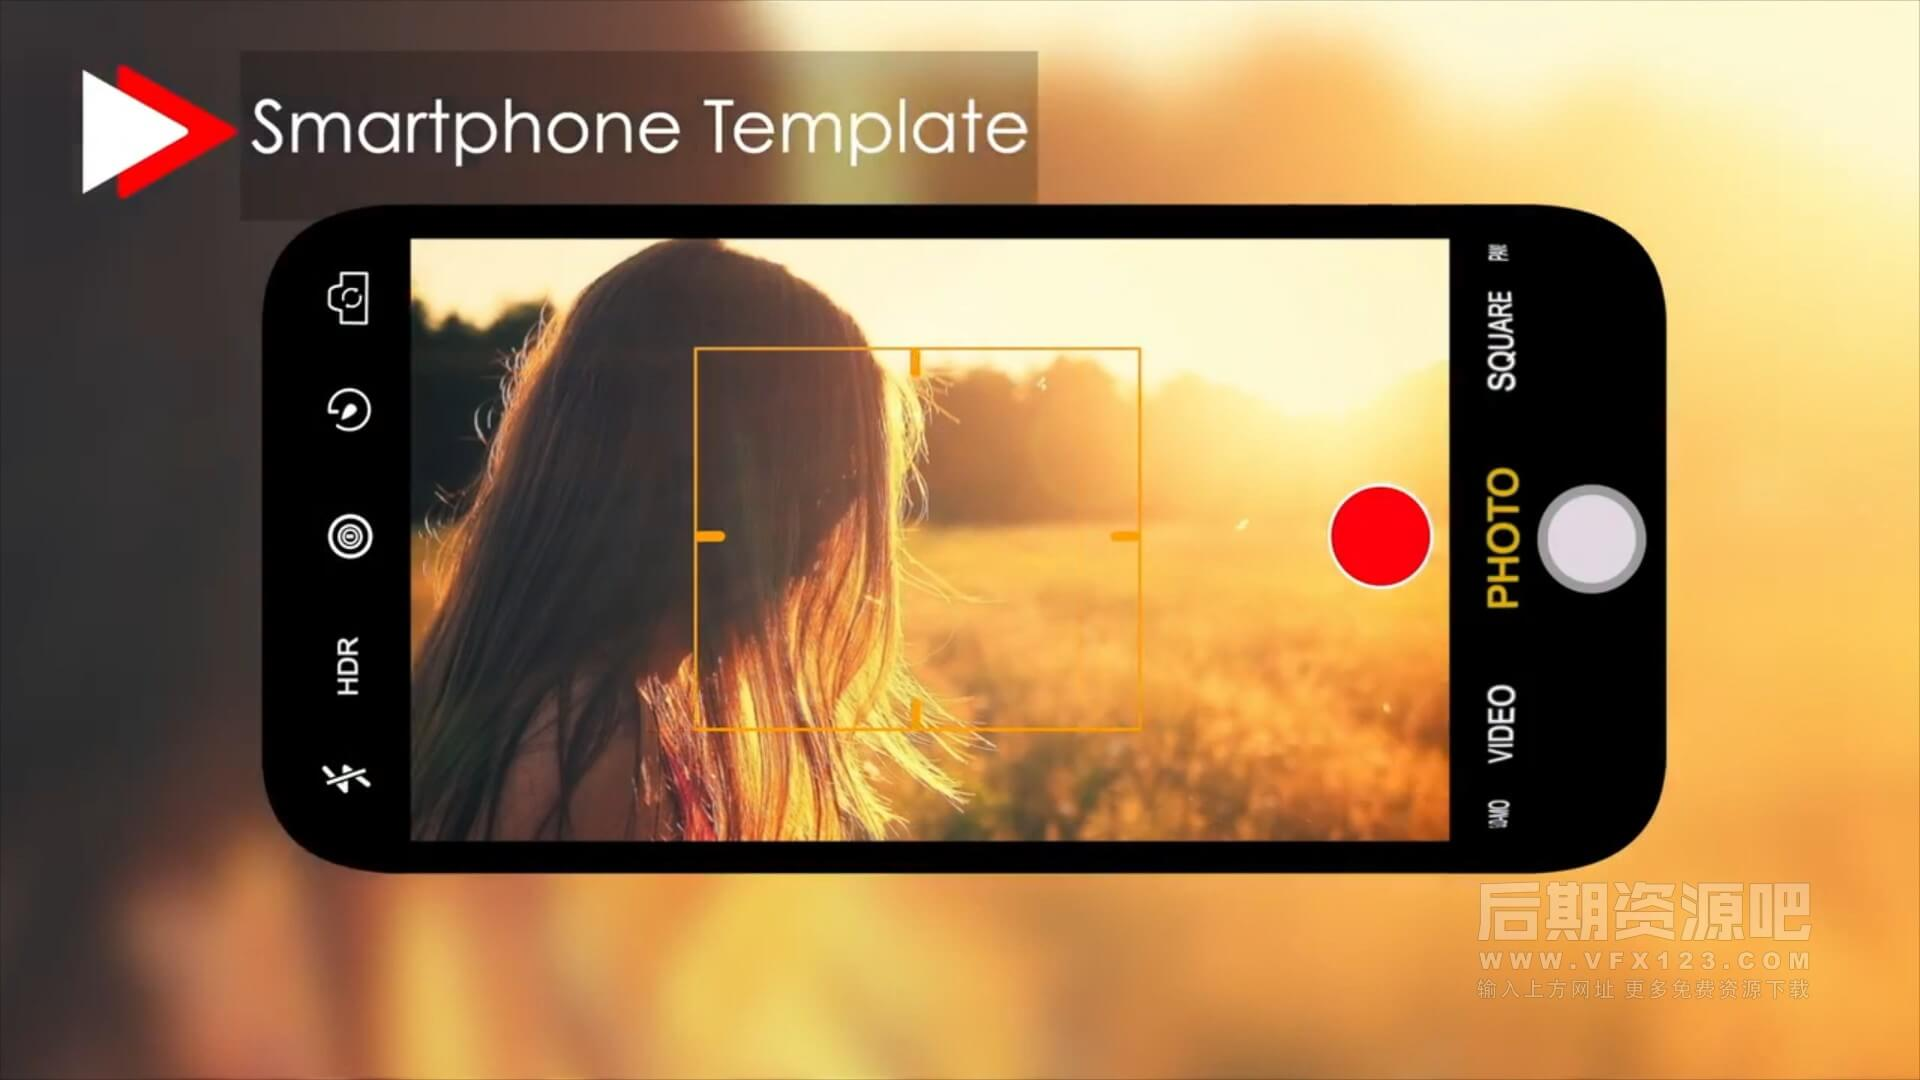 fcpx插件 数码相机手机监控取景器屏显对焦等动画模板 Camera Viewfinder